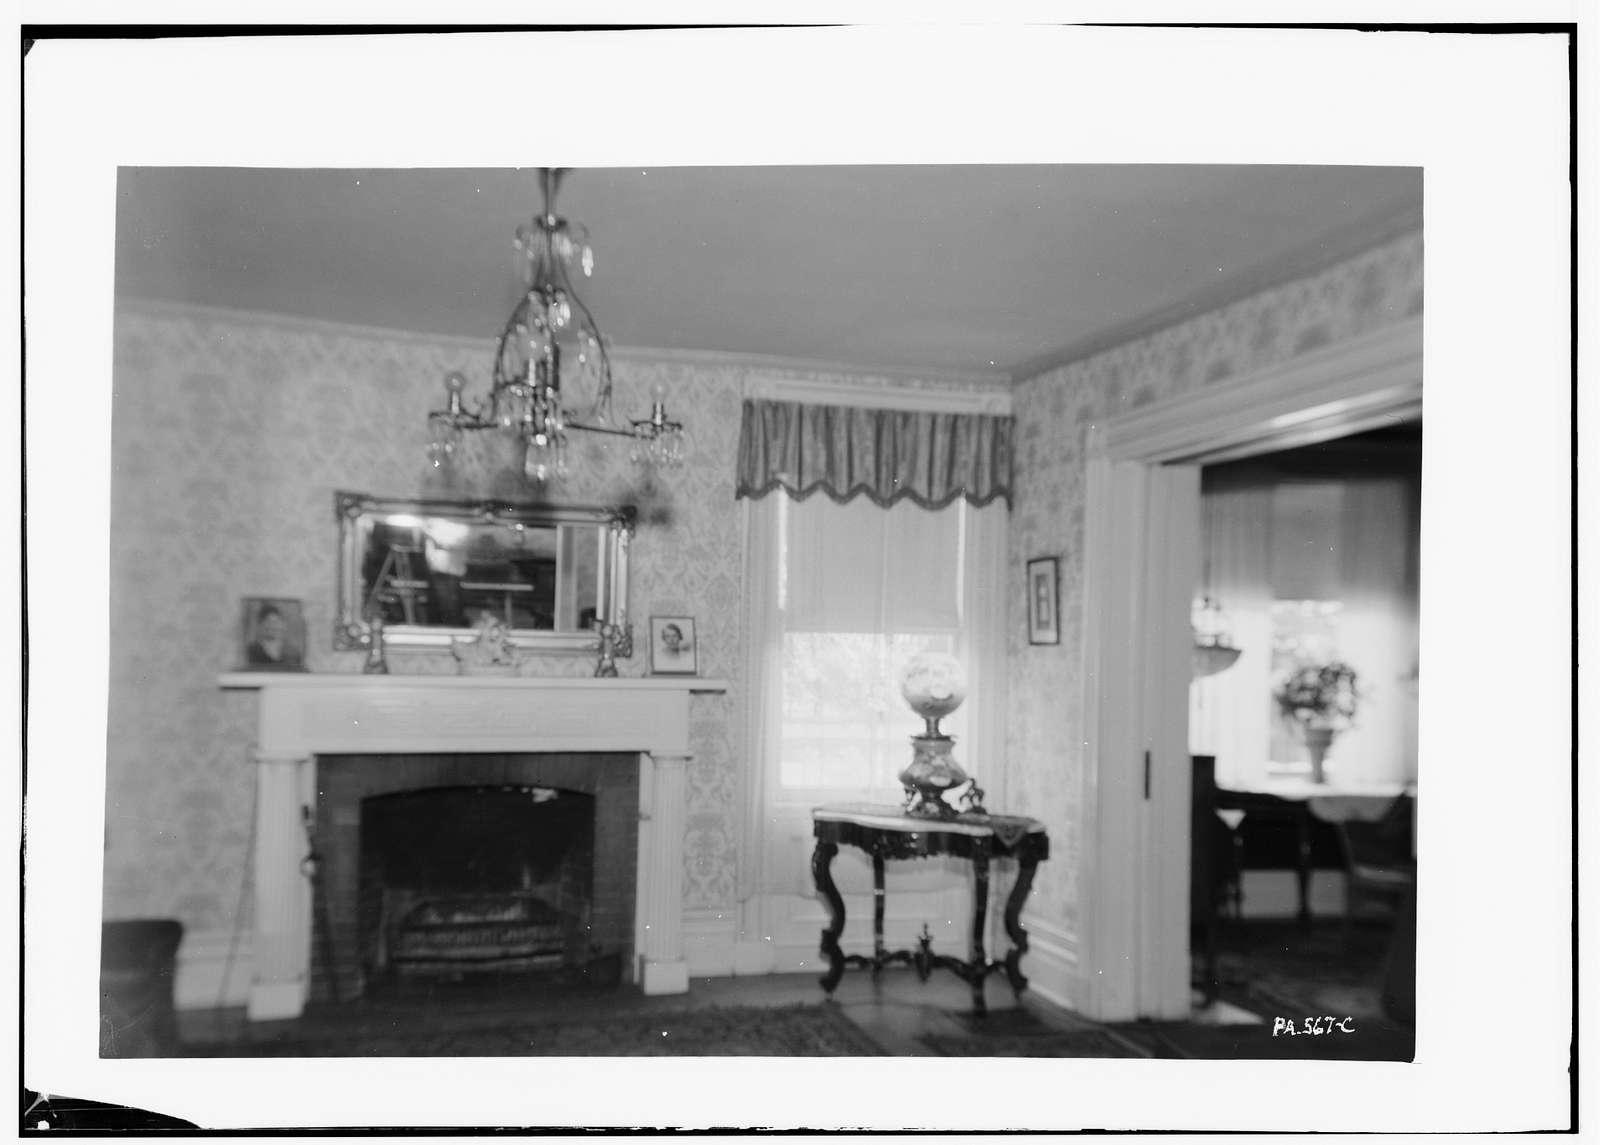 Goodwin House, 36 South Mercer Street, Greenville, Mercer County, PA